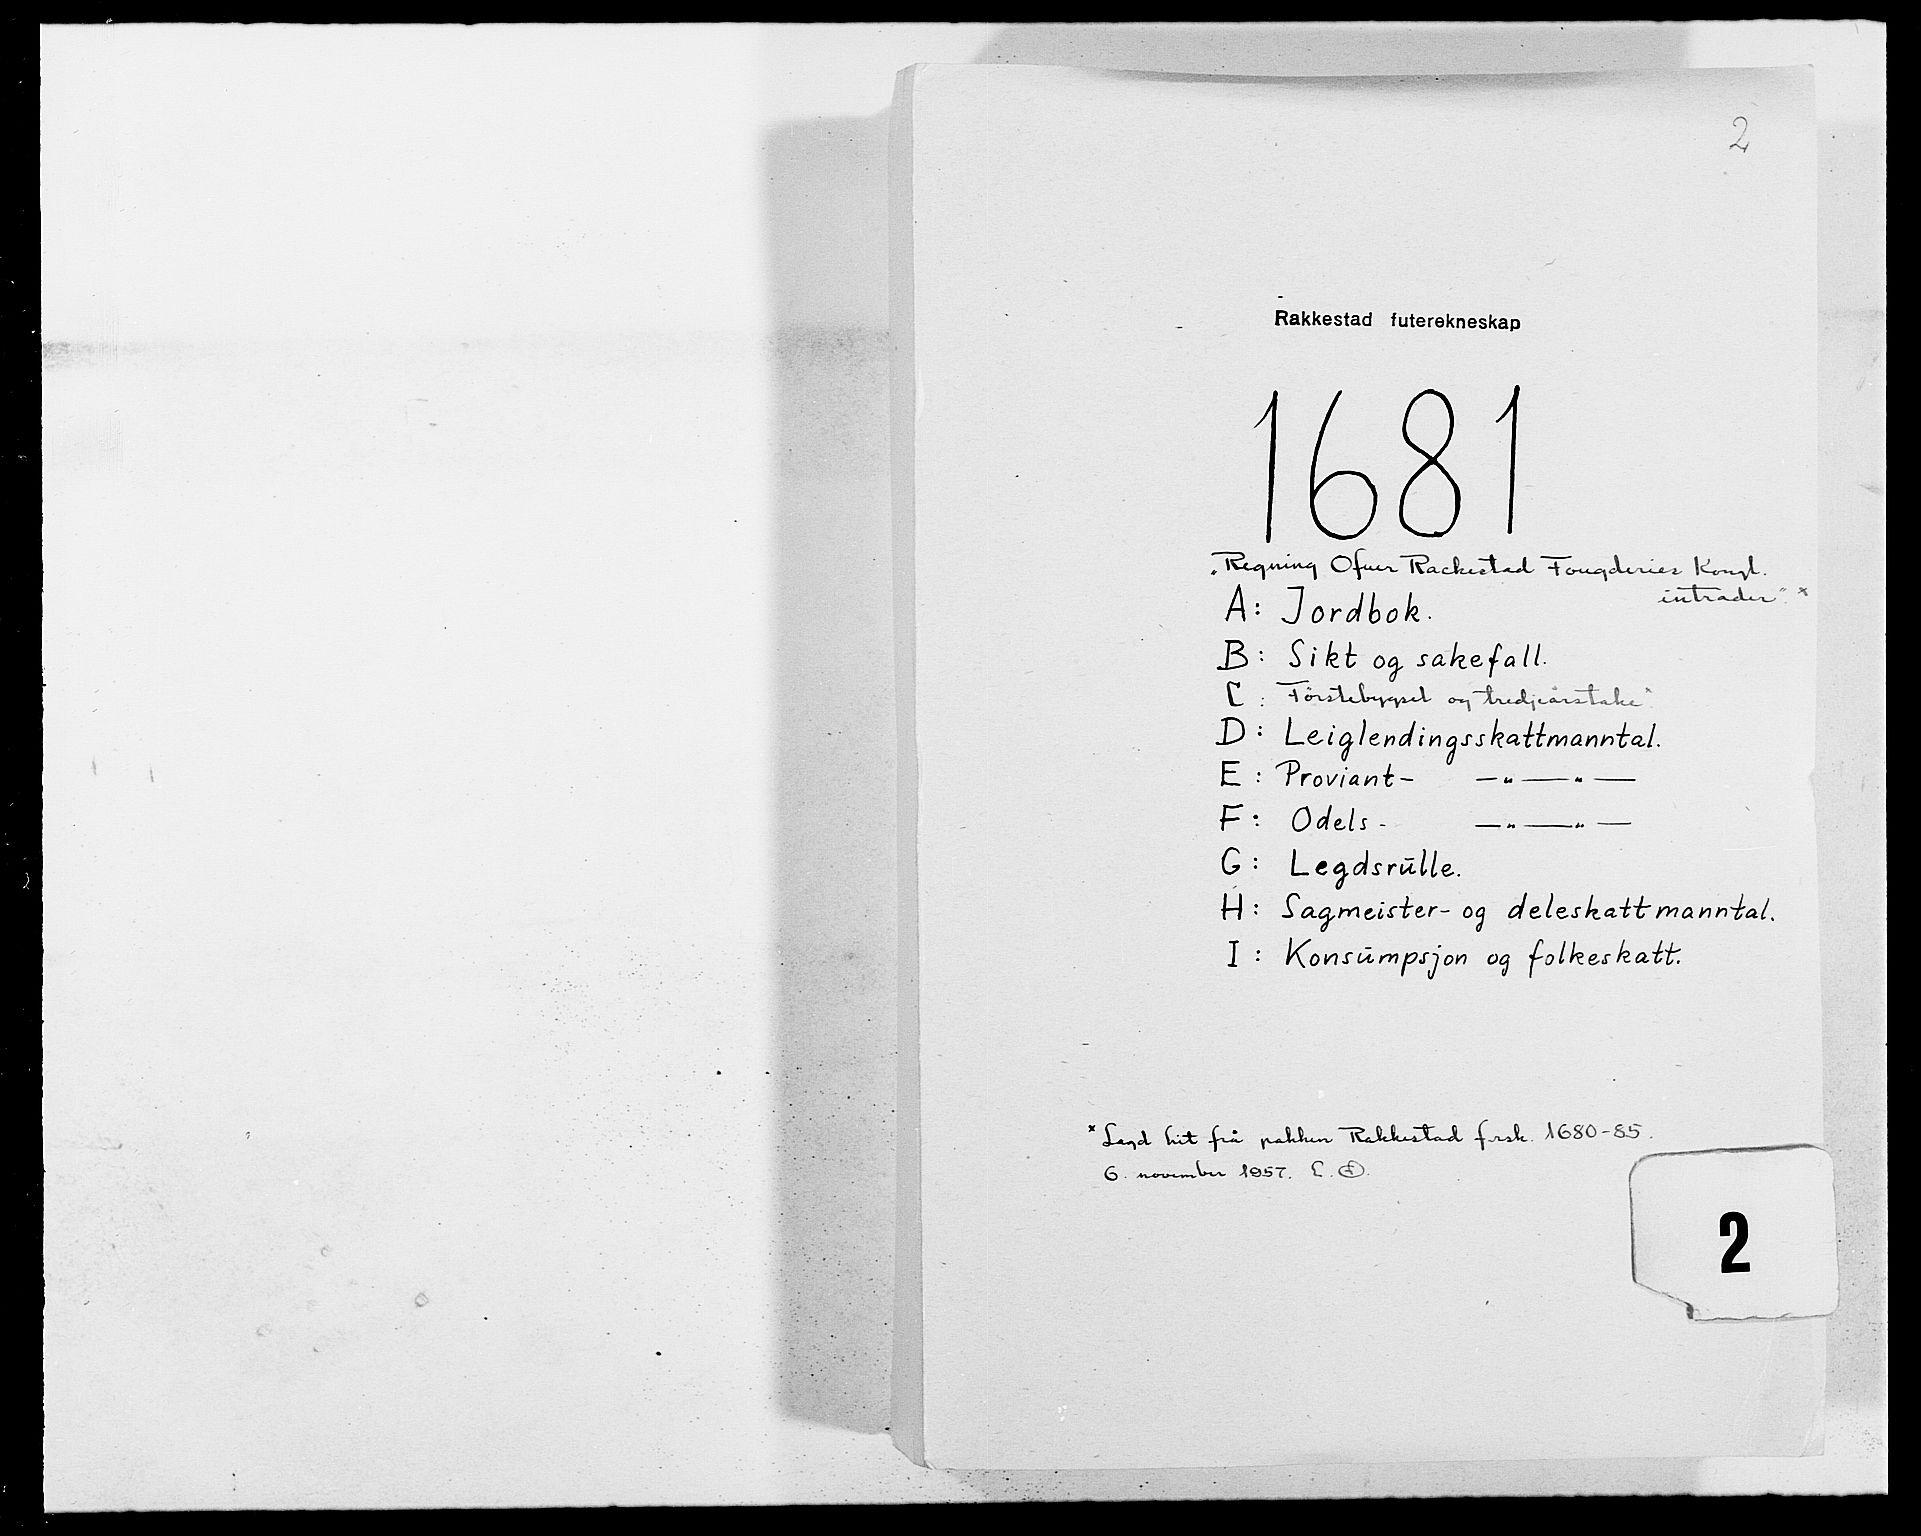 RA, Rentekammeret inntil 1814, Reviderte regnskaper, Fogderegnskap, R05/L0272: Fogderegnskap Rakkestad, 1680-1681, s. 208